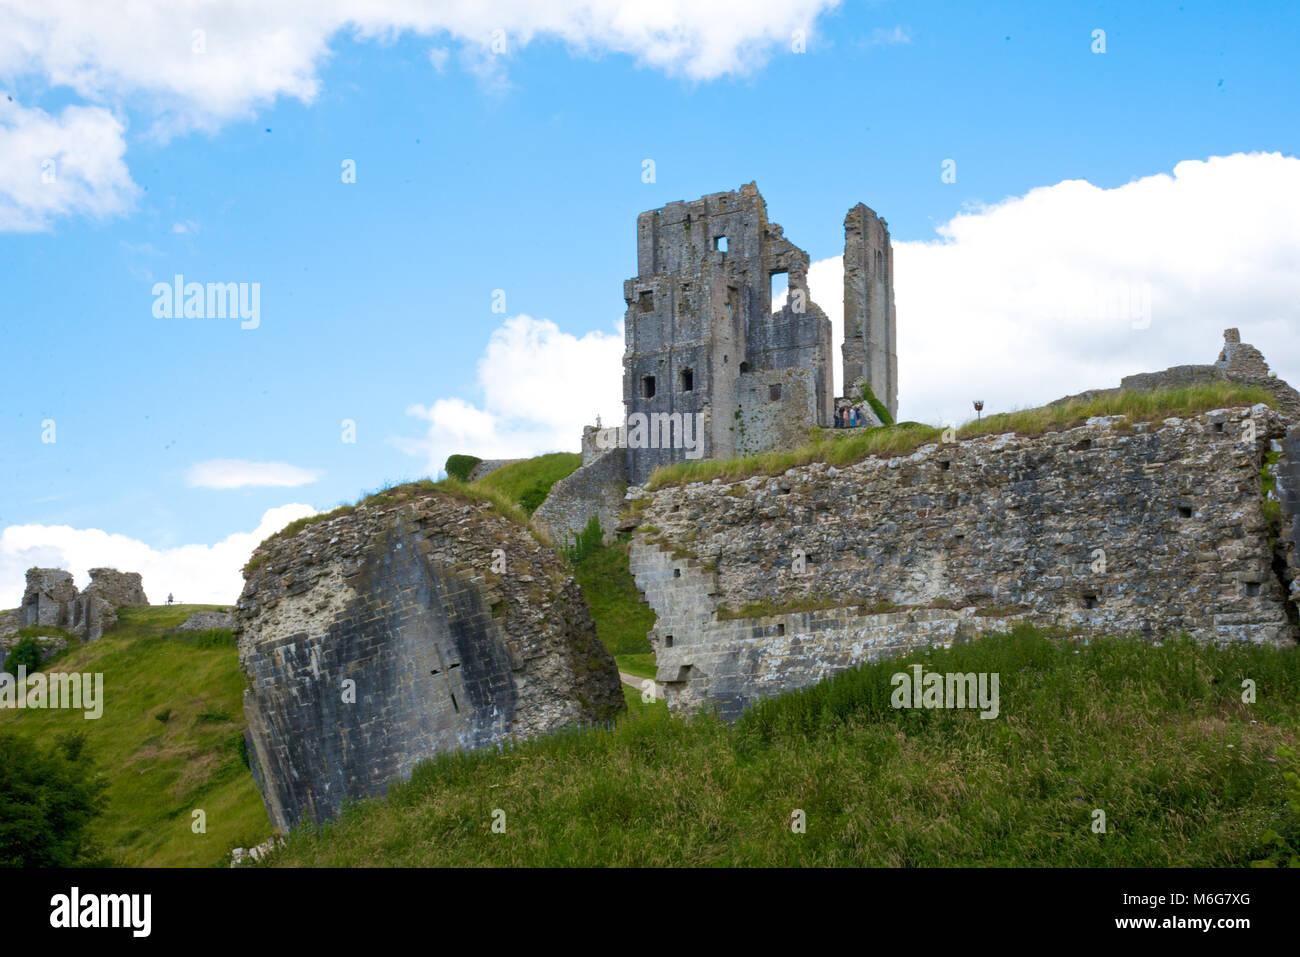 Corfe Castle, Dorset, England - Stock Image